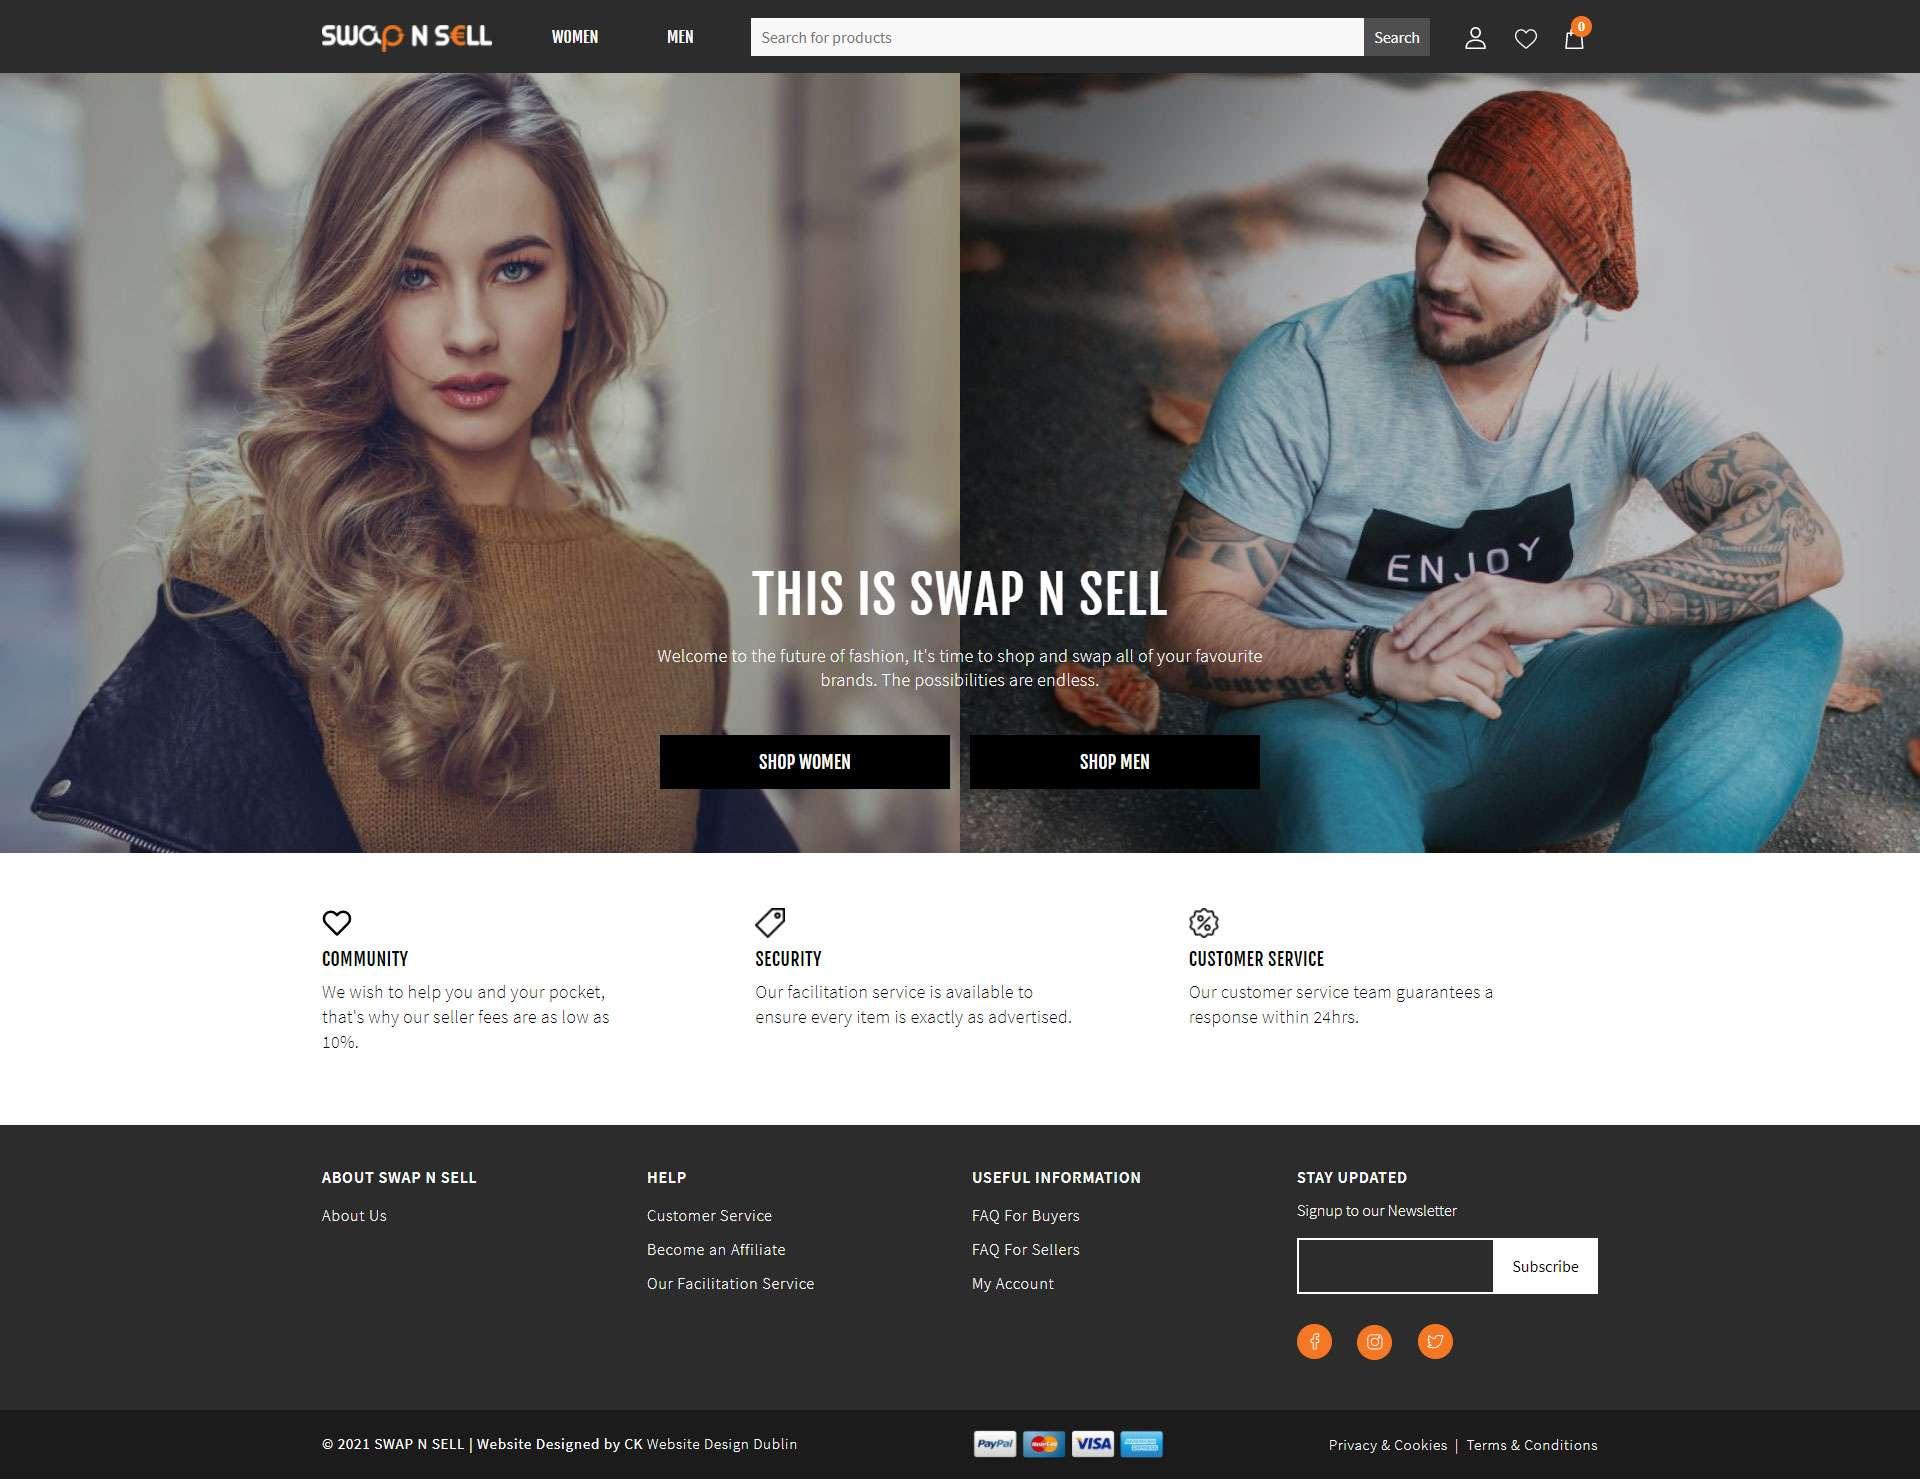 swap n sell home page design my ck website design dublin ireland